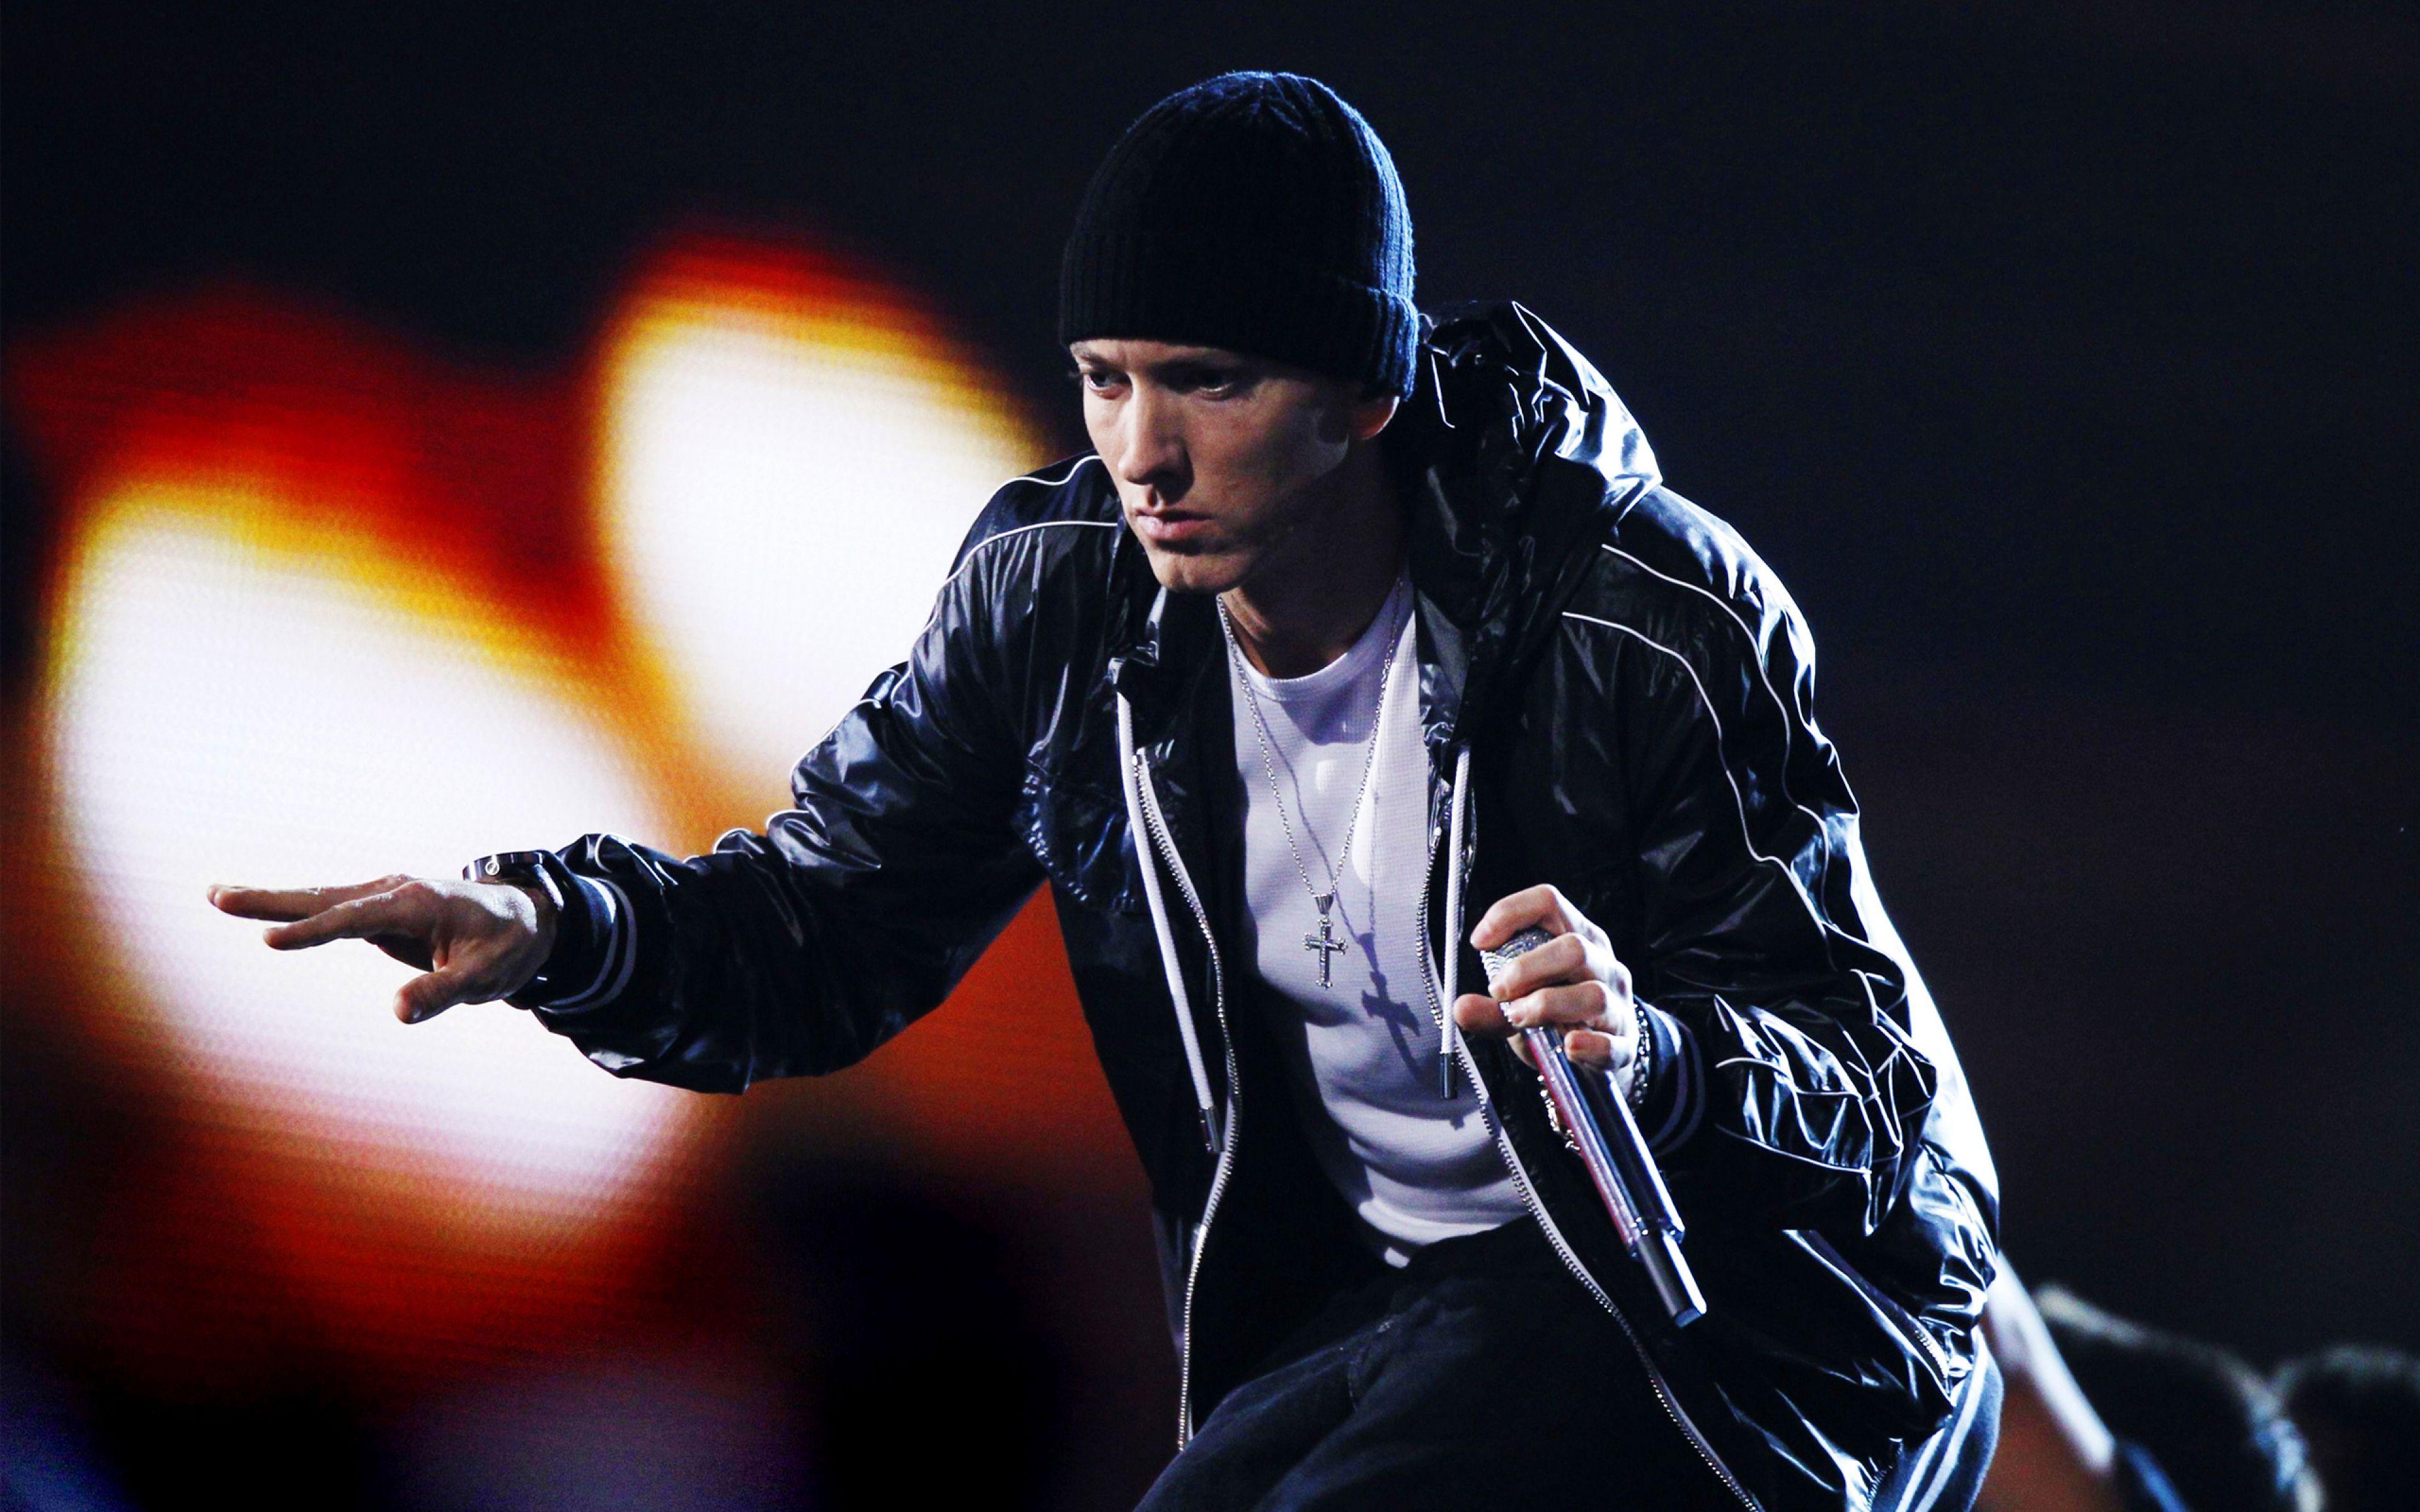 Most Inspiring Wallpaper Logo Eminem - c3323312ecfb6792956820a6e6fb0cc9  Graphic_961356.jpg